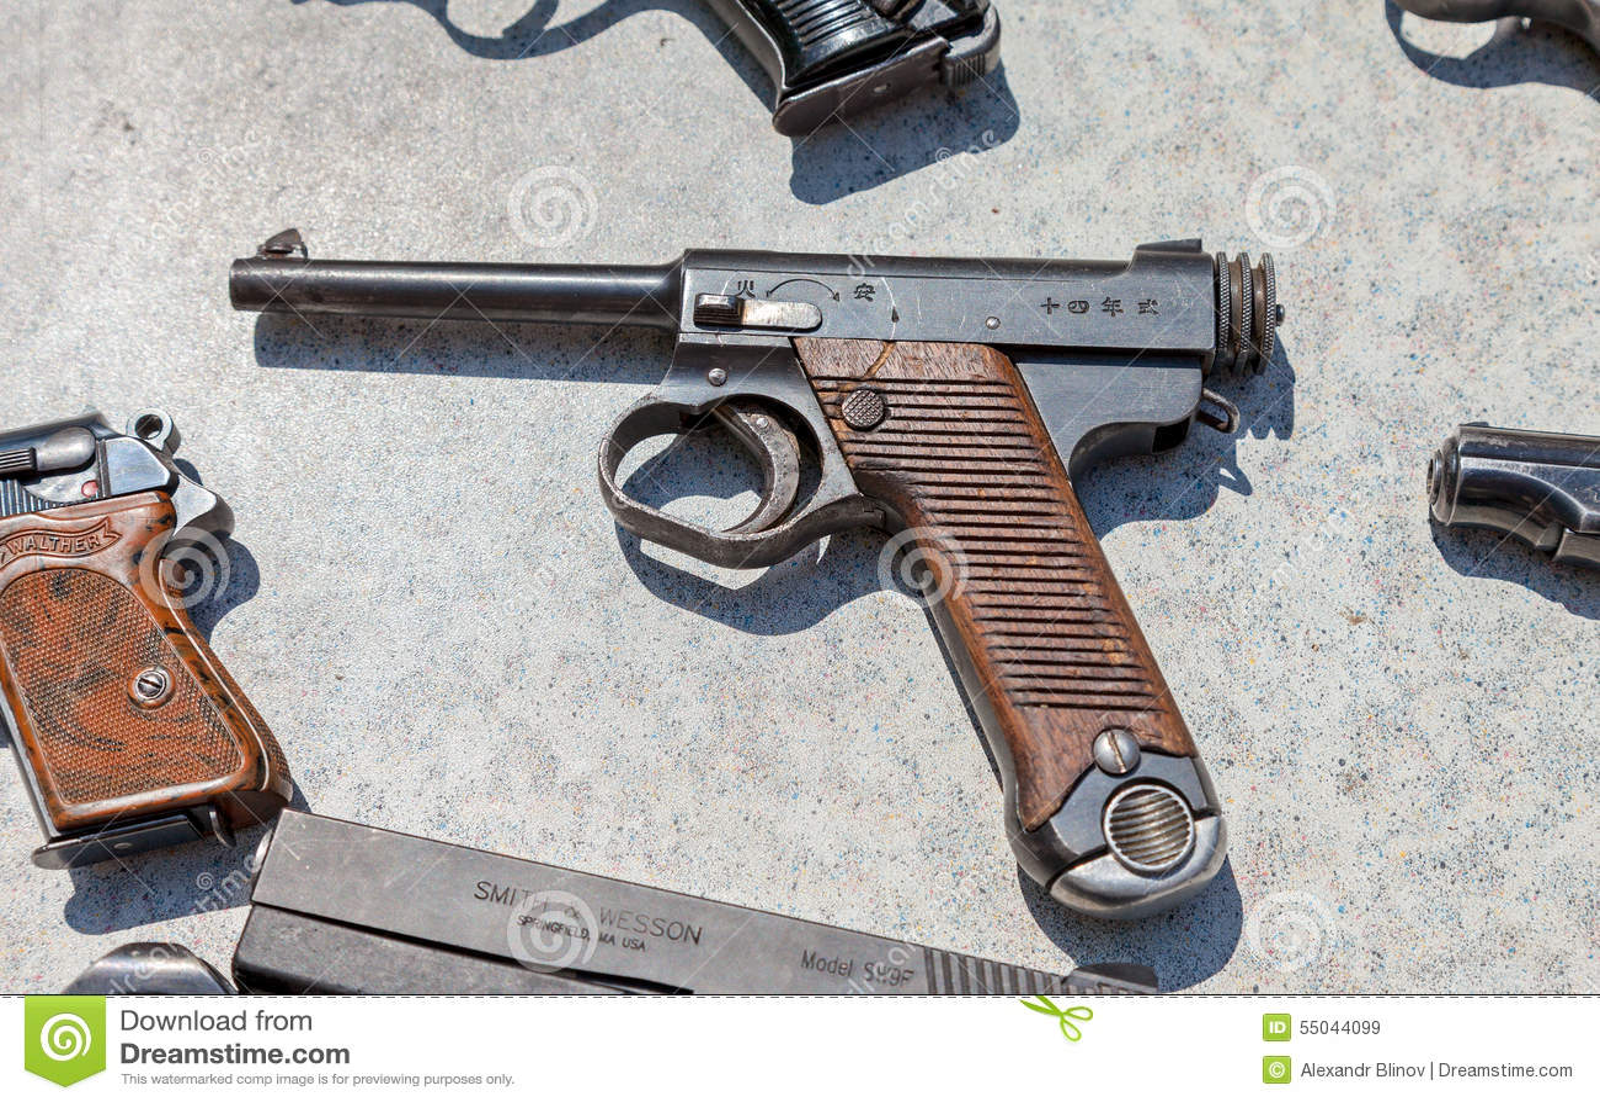 Alexandr pistoletov from russia to ukraine 2